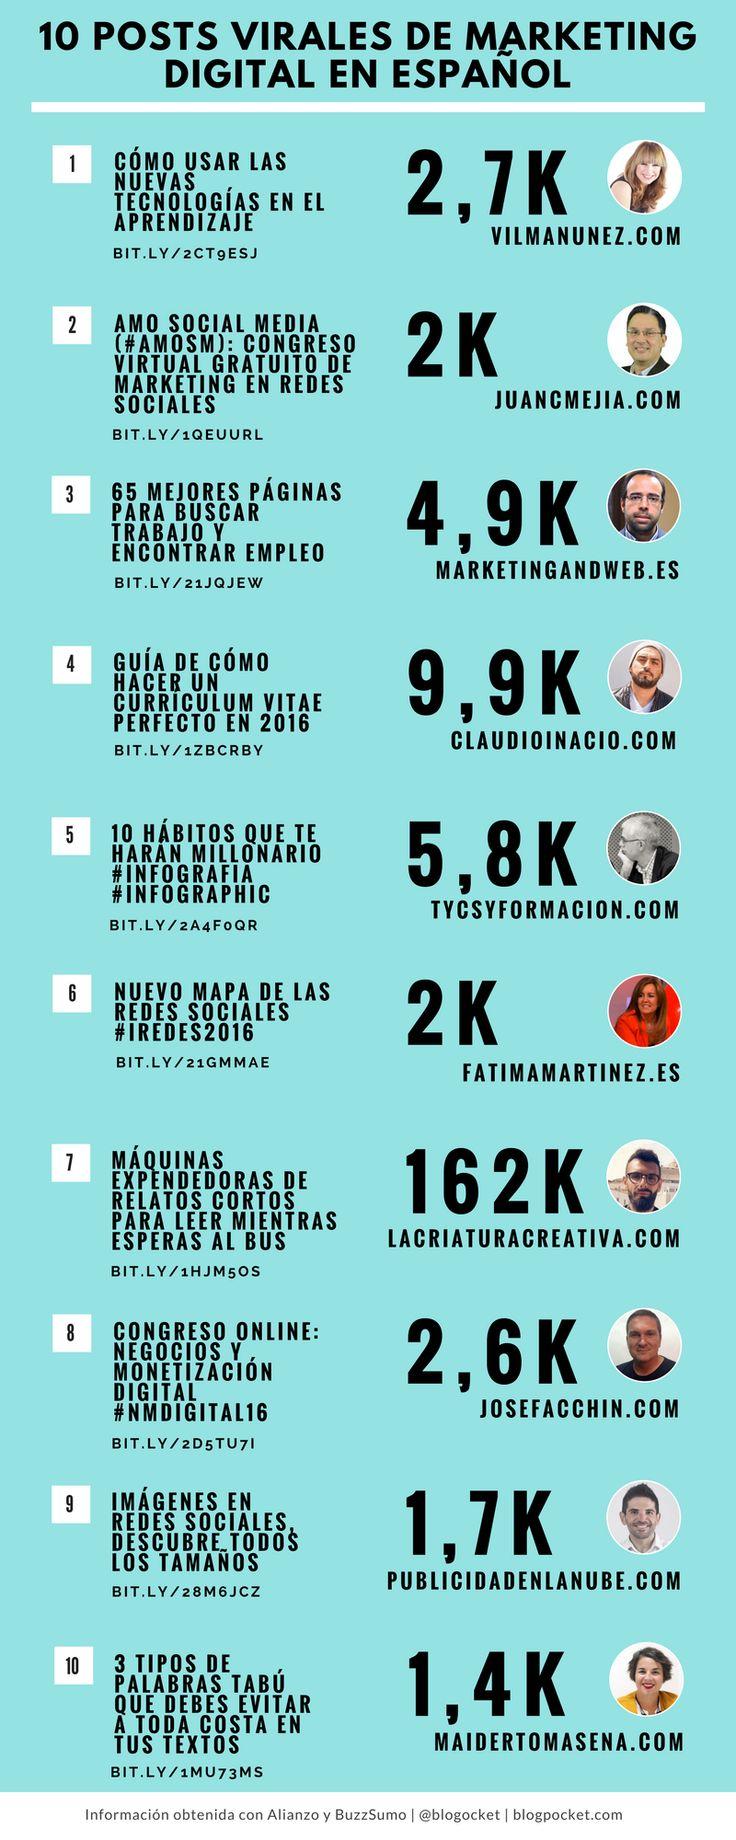 10-posts-virales-marketing-digital-espanol-infografia-2